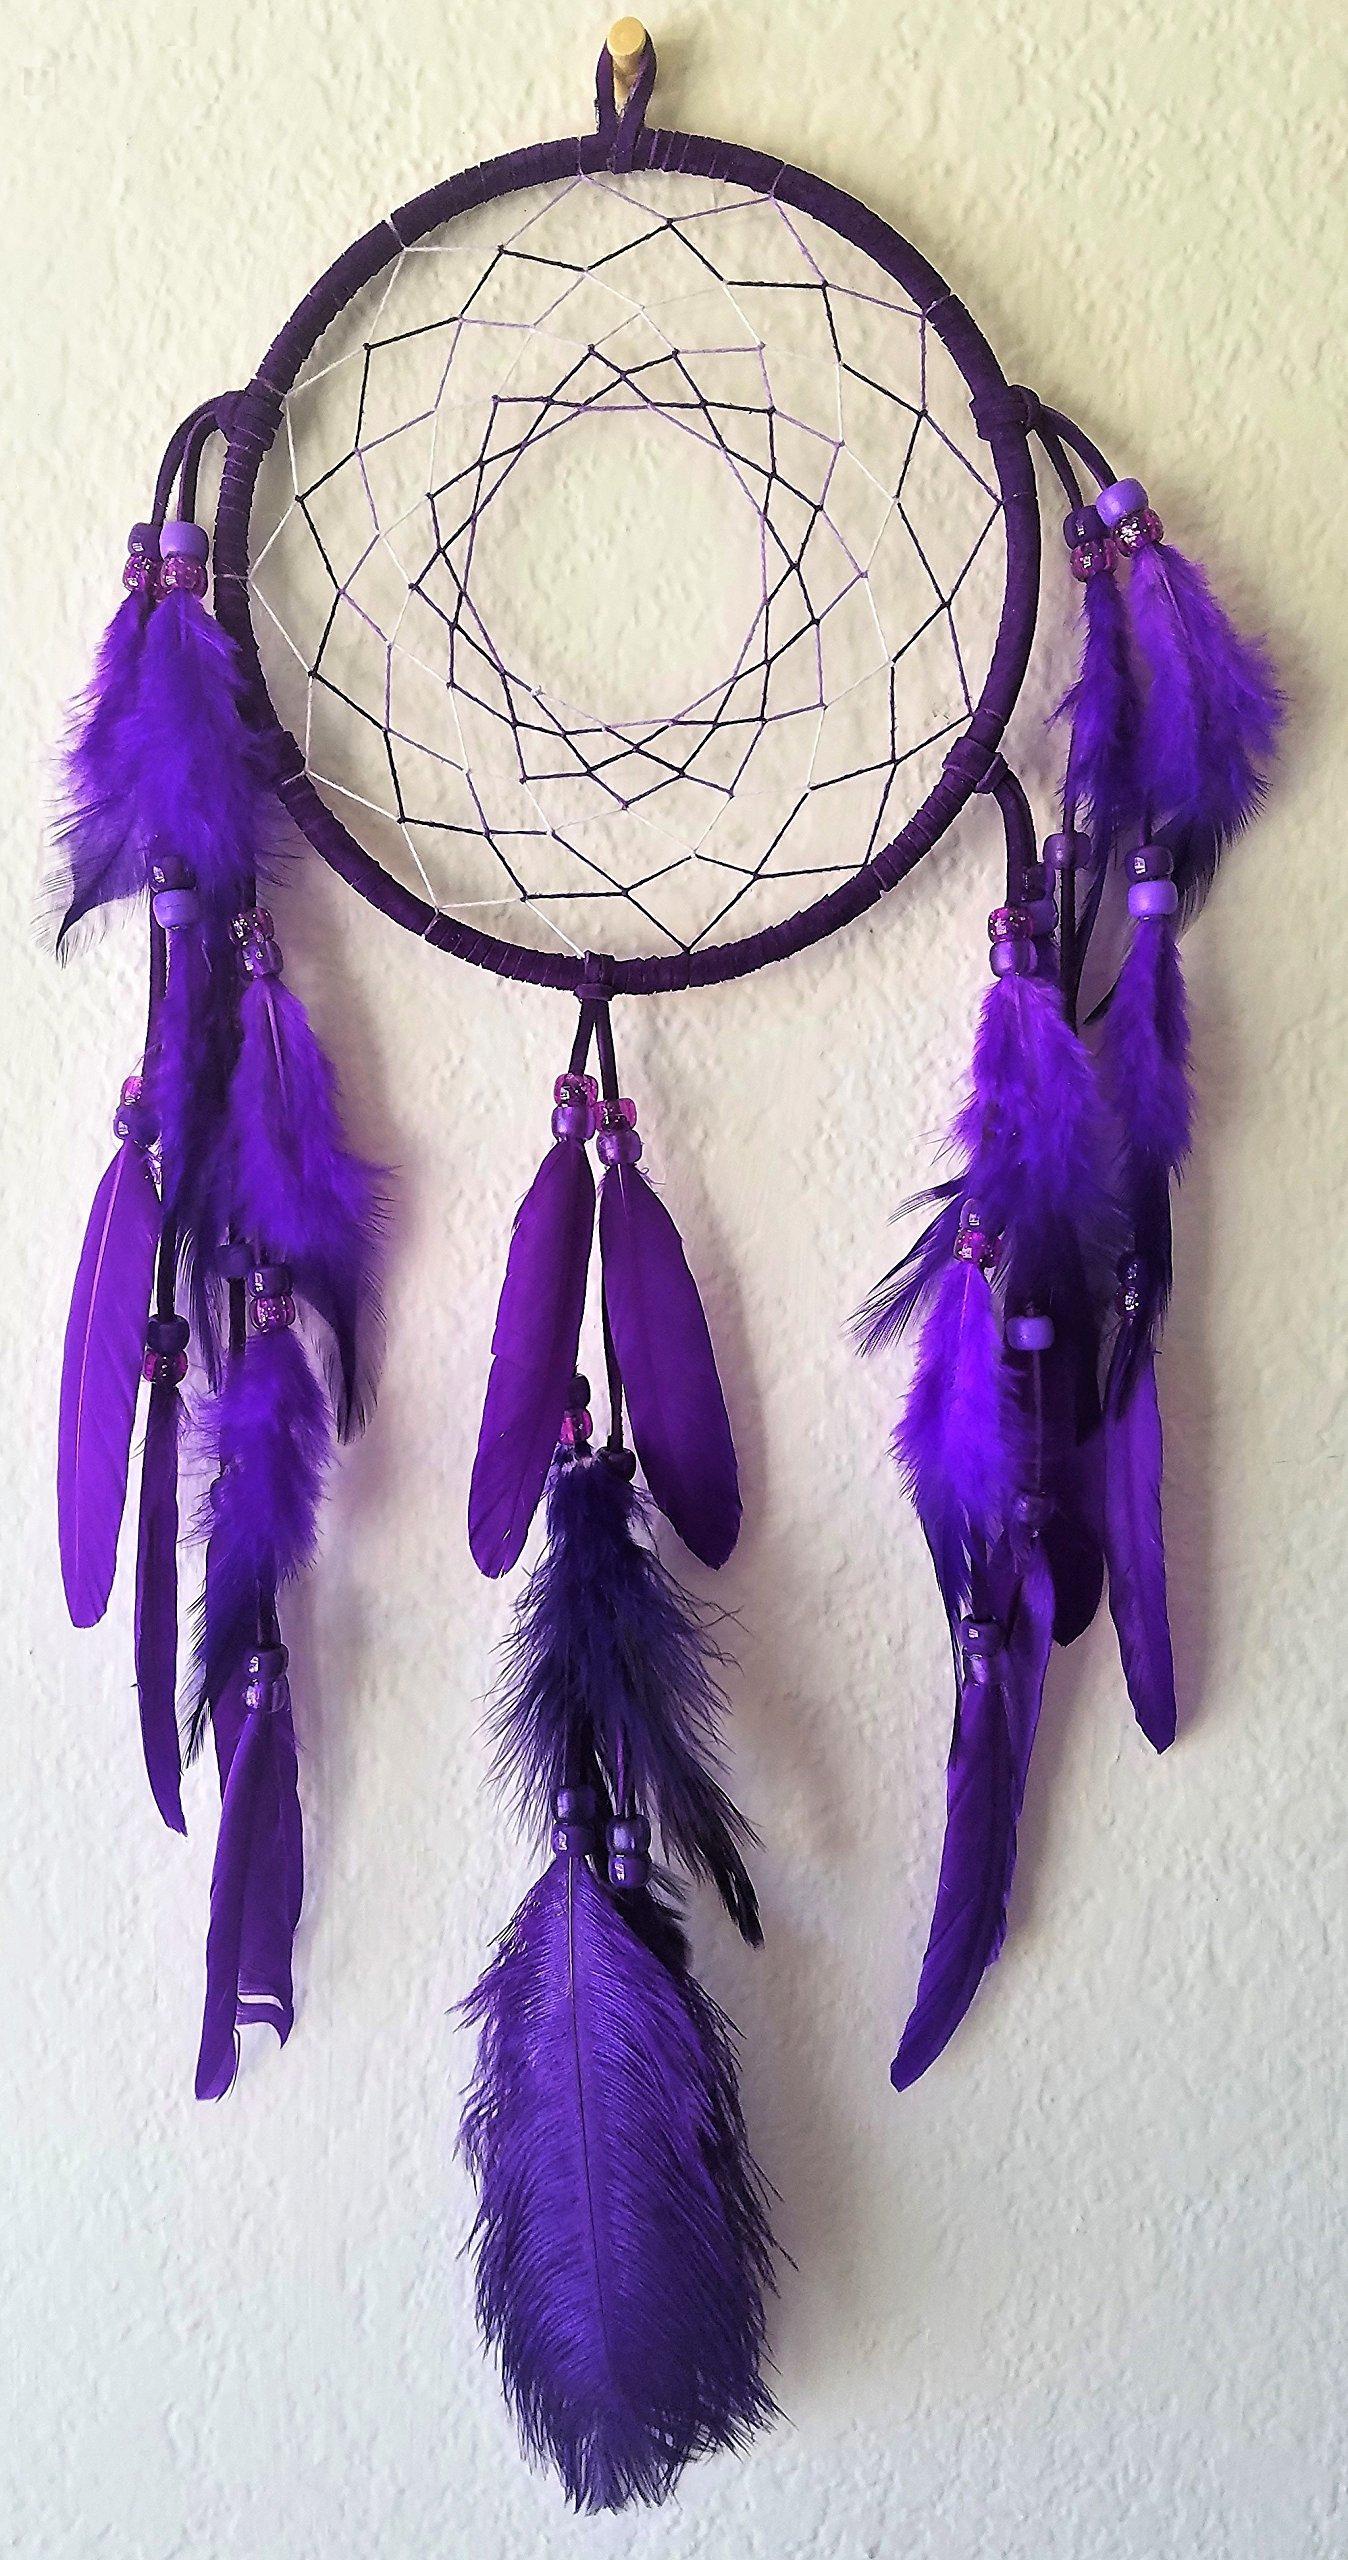 Purple Dream Catcher Medium size purple Dreamcatcher handmade mobile/wall hanging